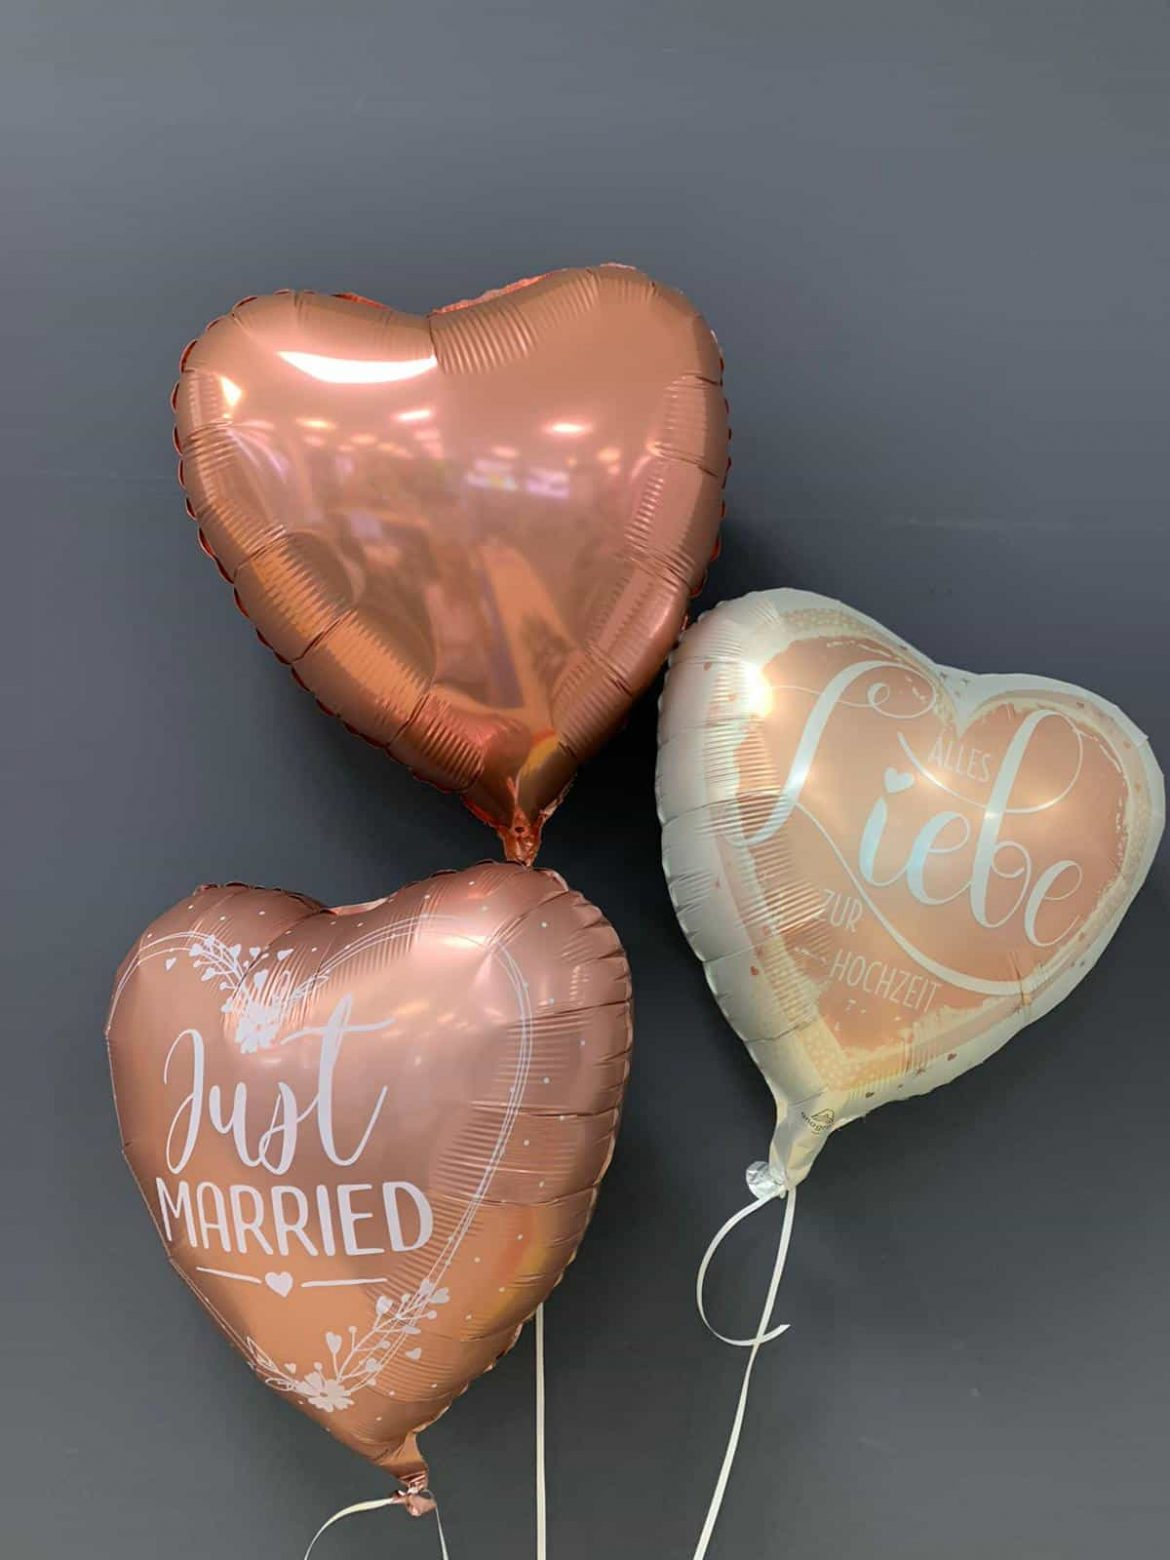 Just Married € 5,90<br />Alles Liebe € 5,90<br />Dekoballon € 4,50 1